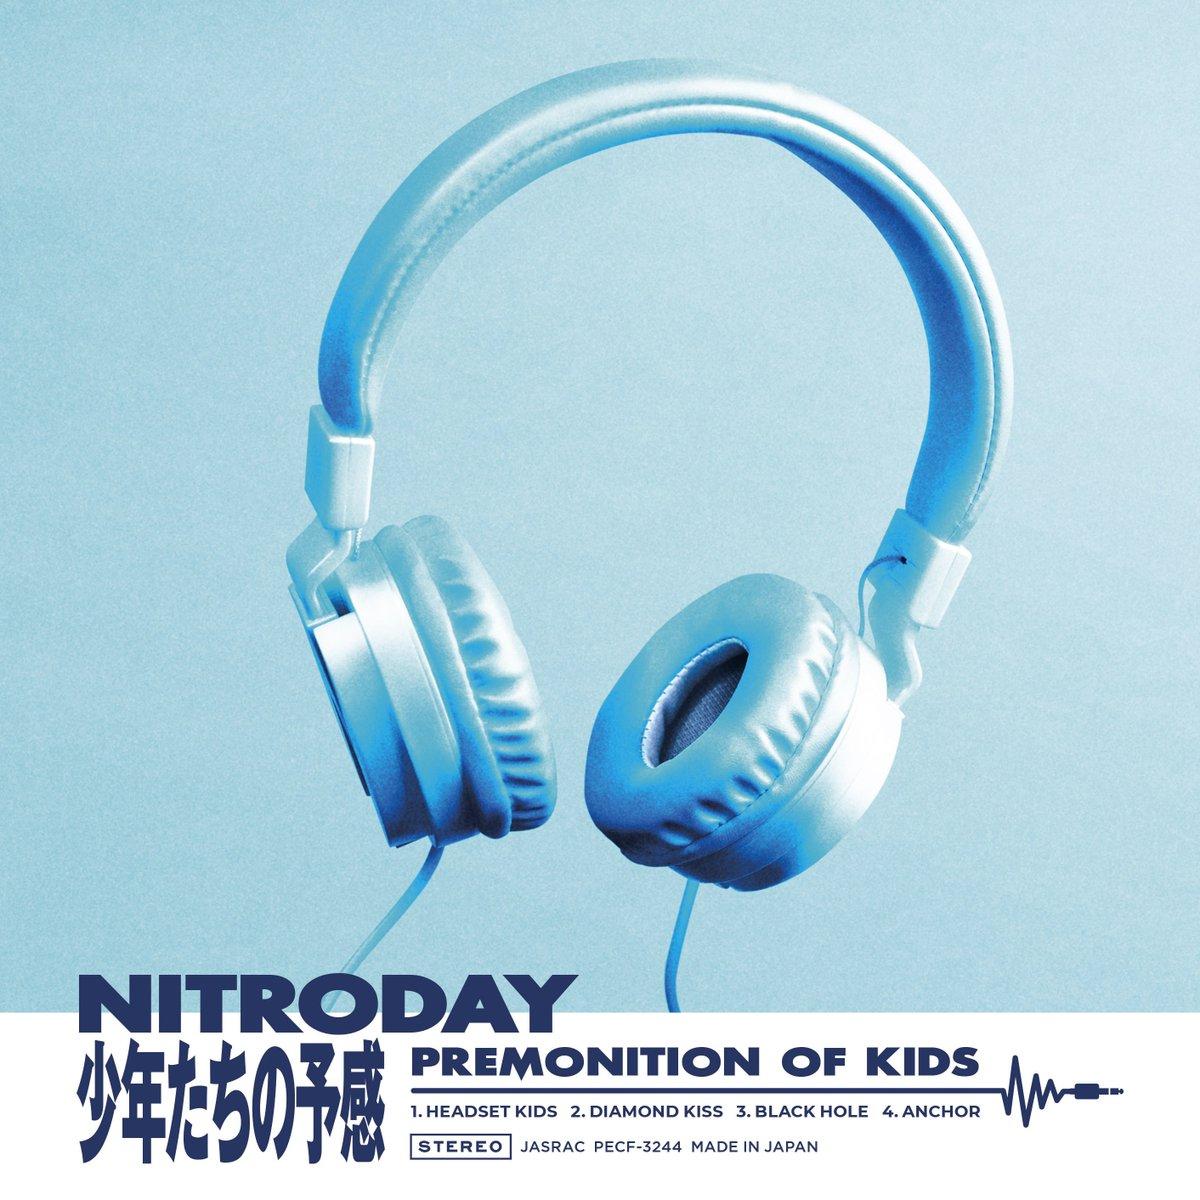 『NITRODAY - ヘッドセット・キッズ』収録の『少年たちの予感』ジャケット